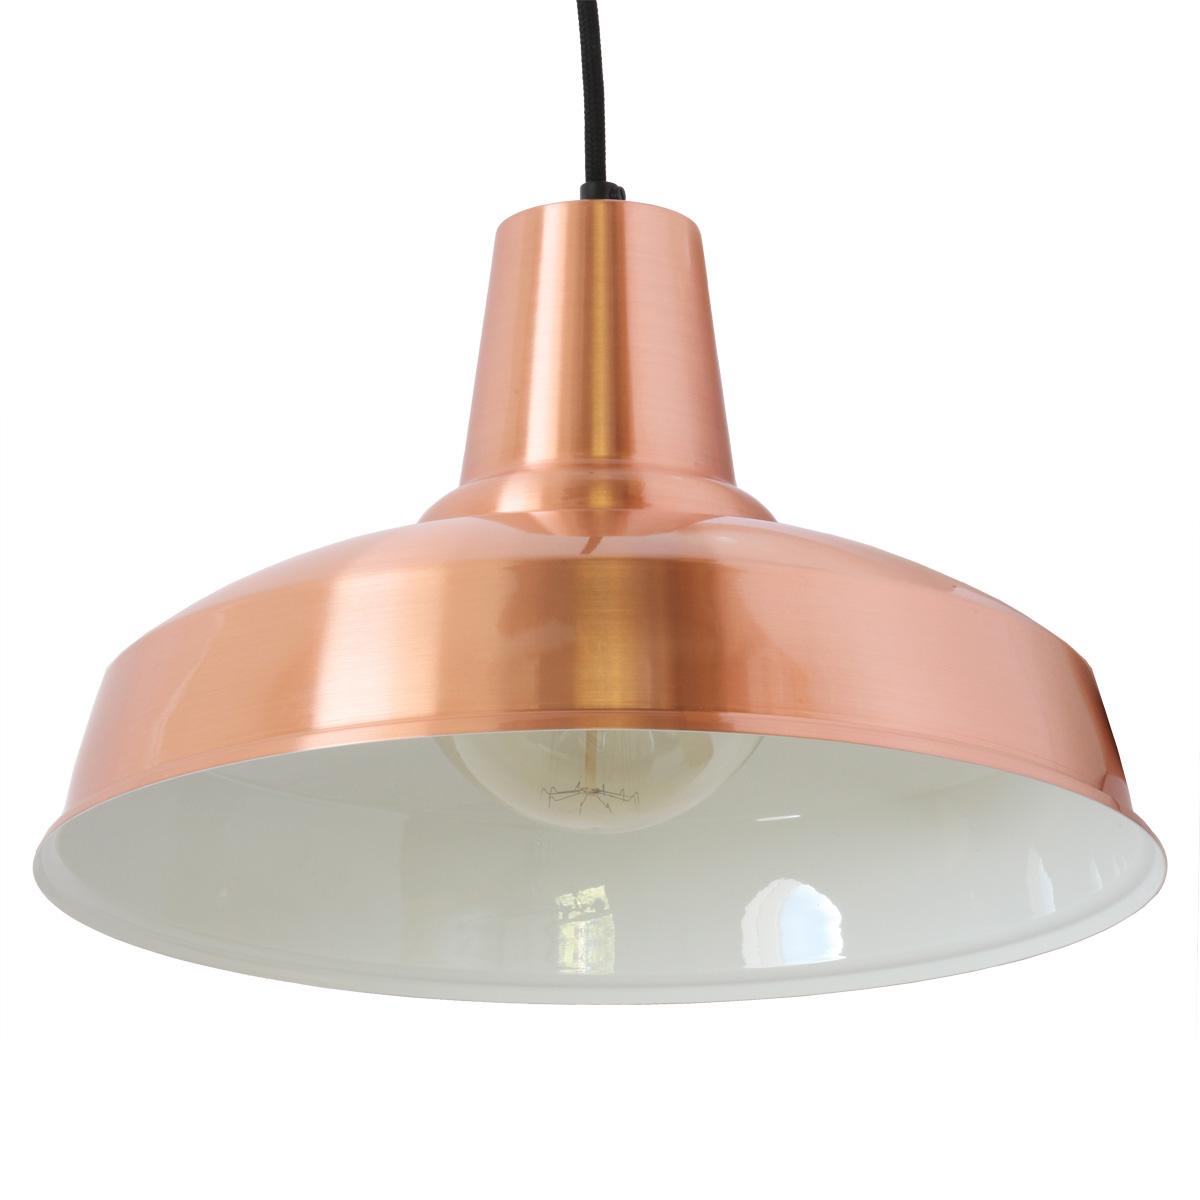 Bevorzugt Kupfer-Pendelleuchte aus Dänemark PANDULERA - Casa Lumi TL43